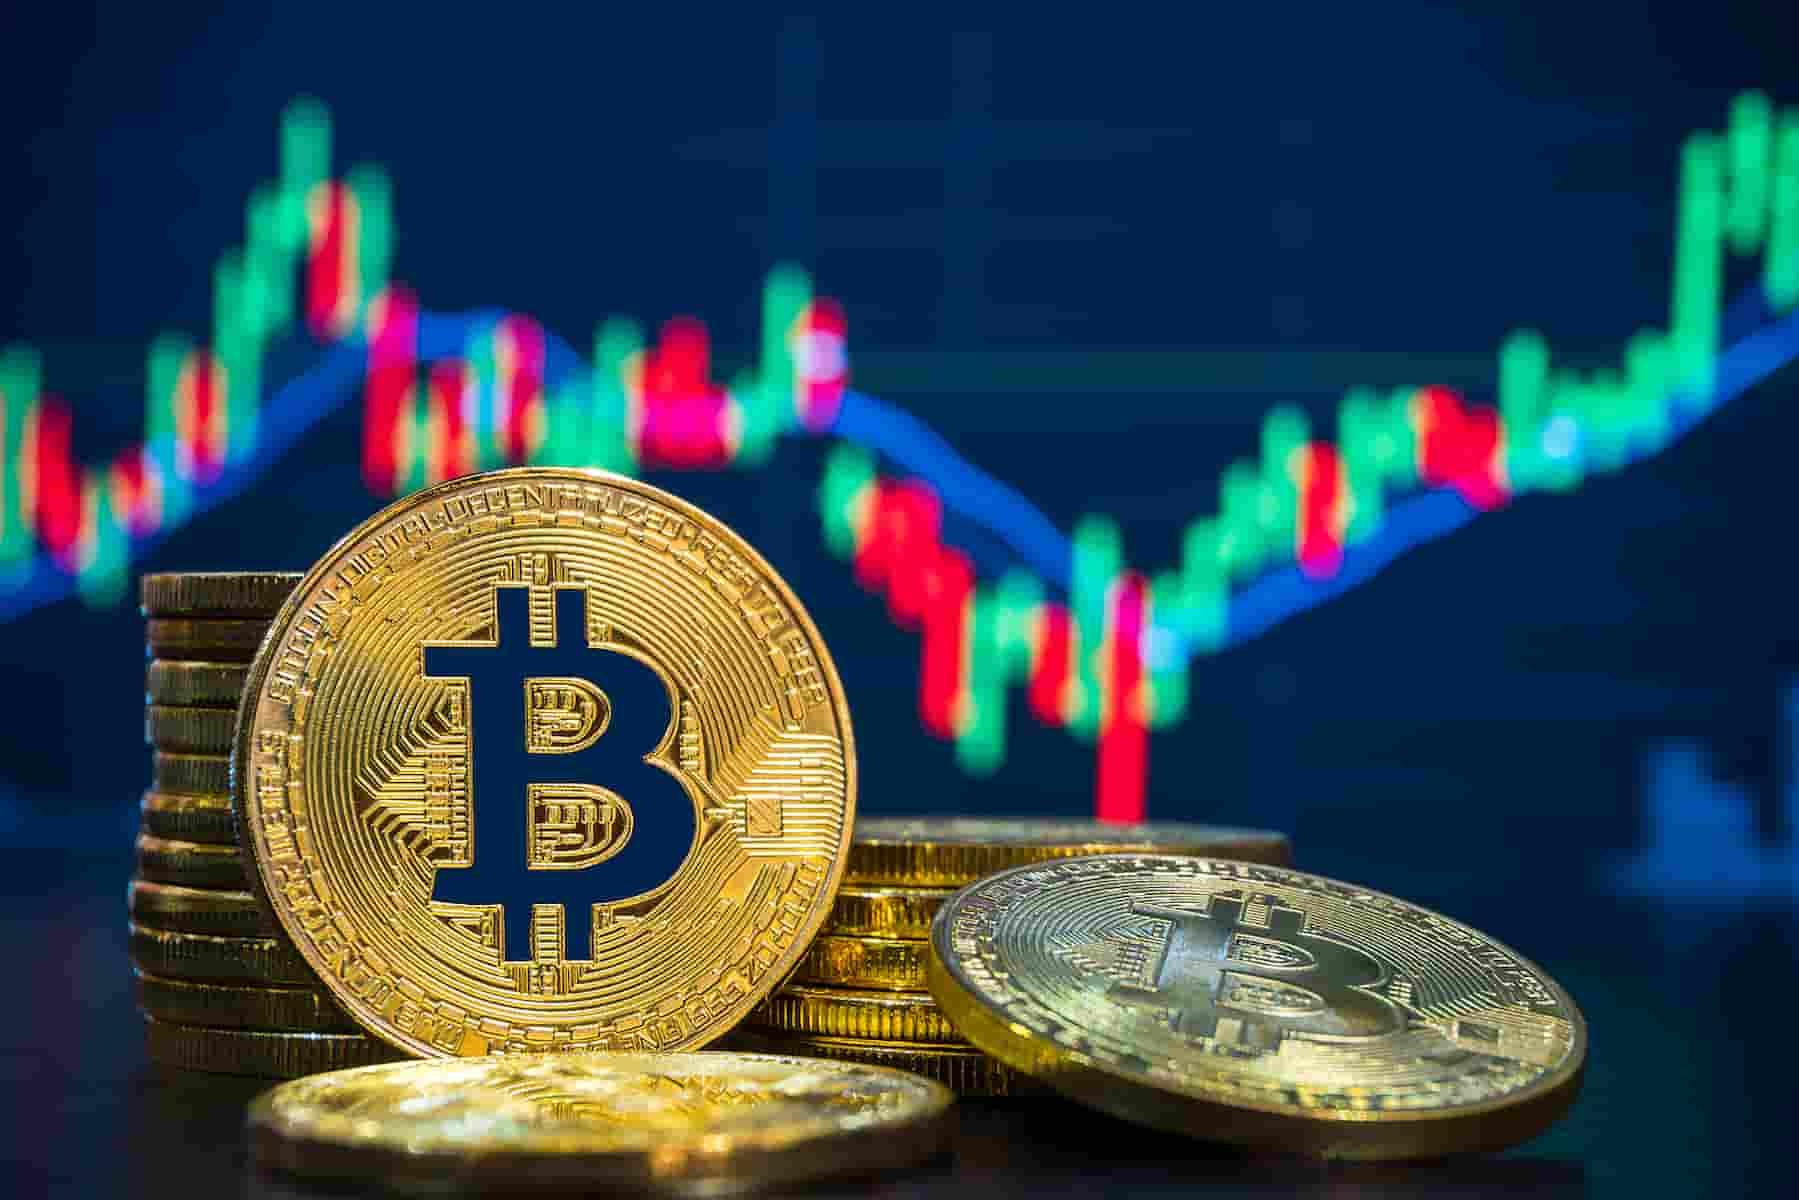 Empresa de capital riesgo compra 500 millones de dólares en bitcoins